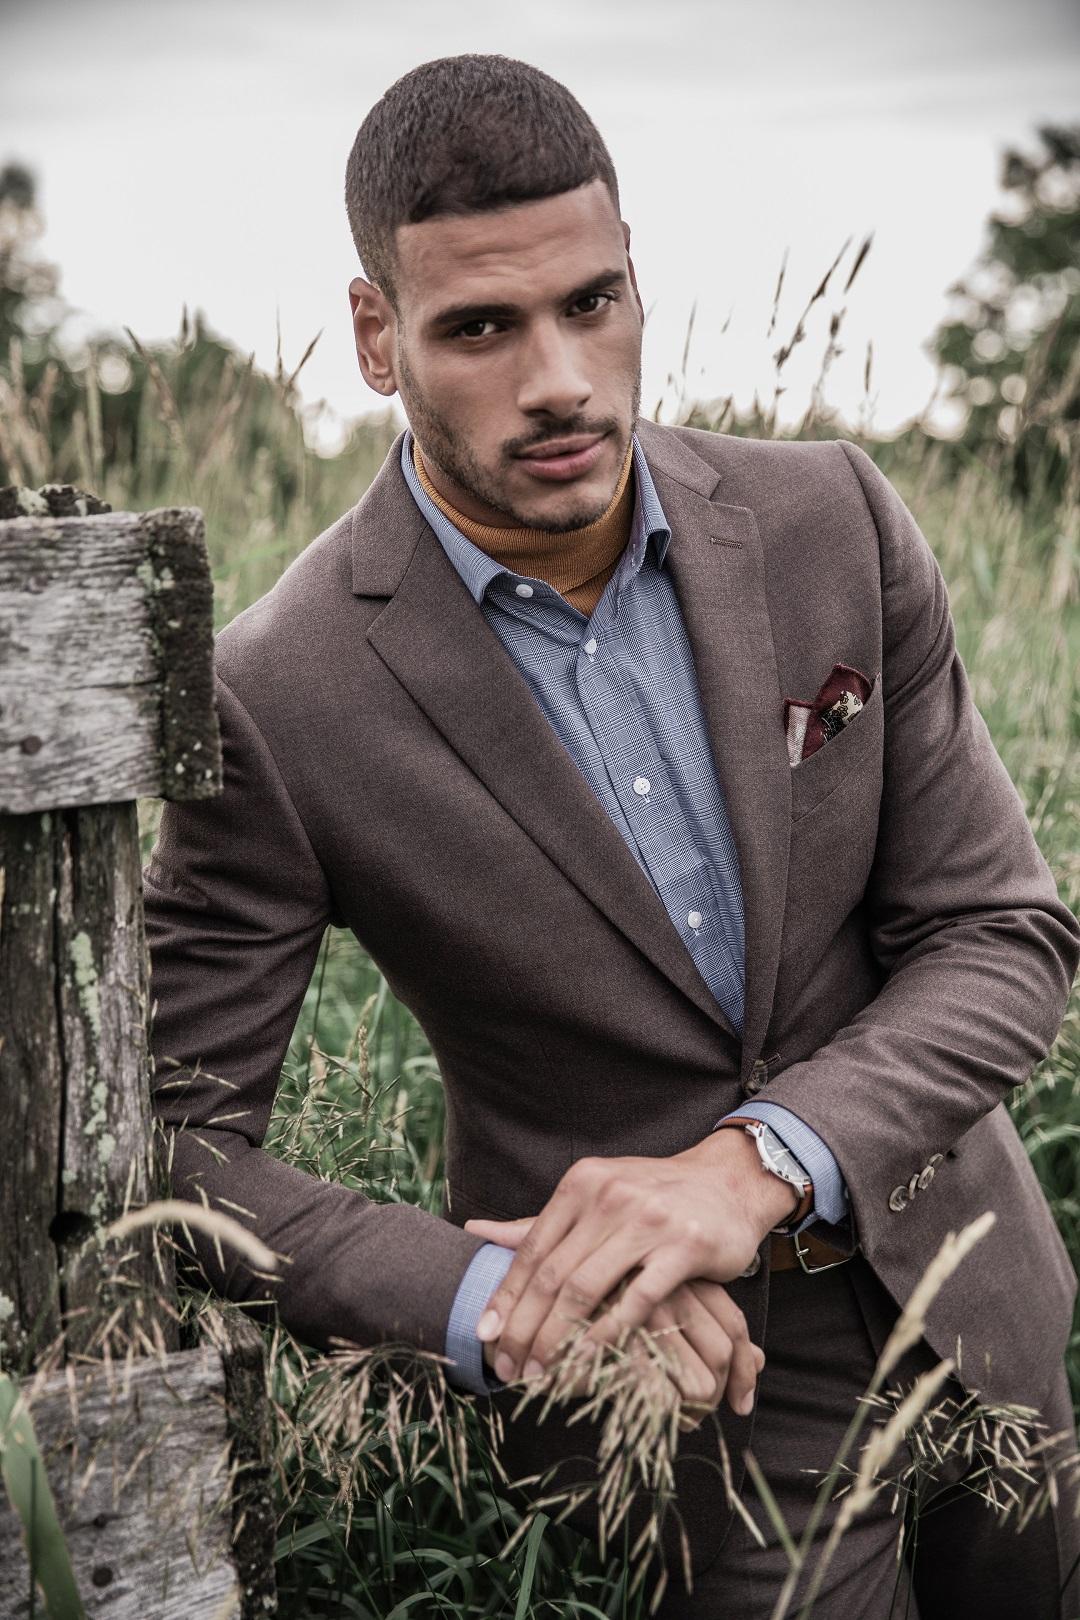 Hayward Flannel Brown Suit